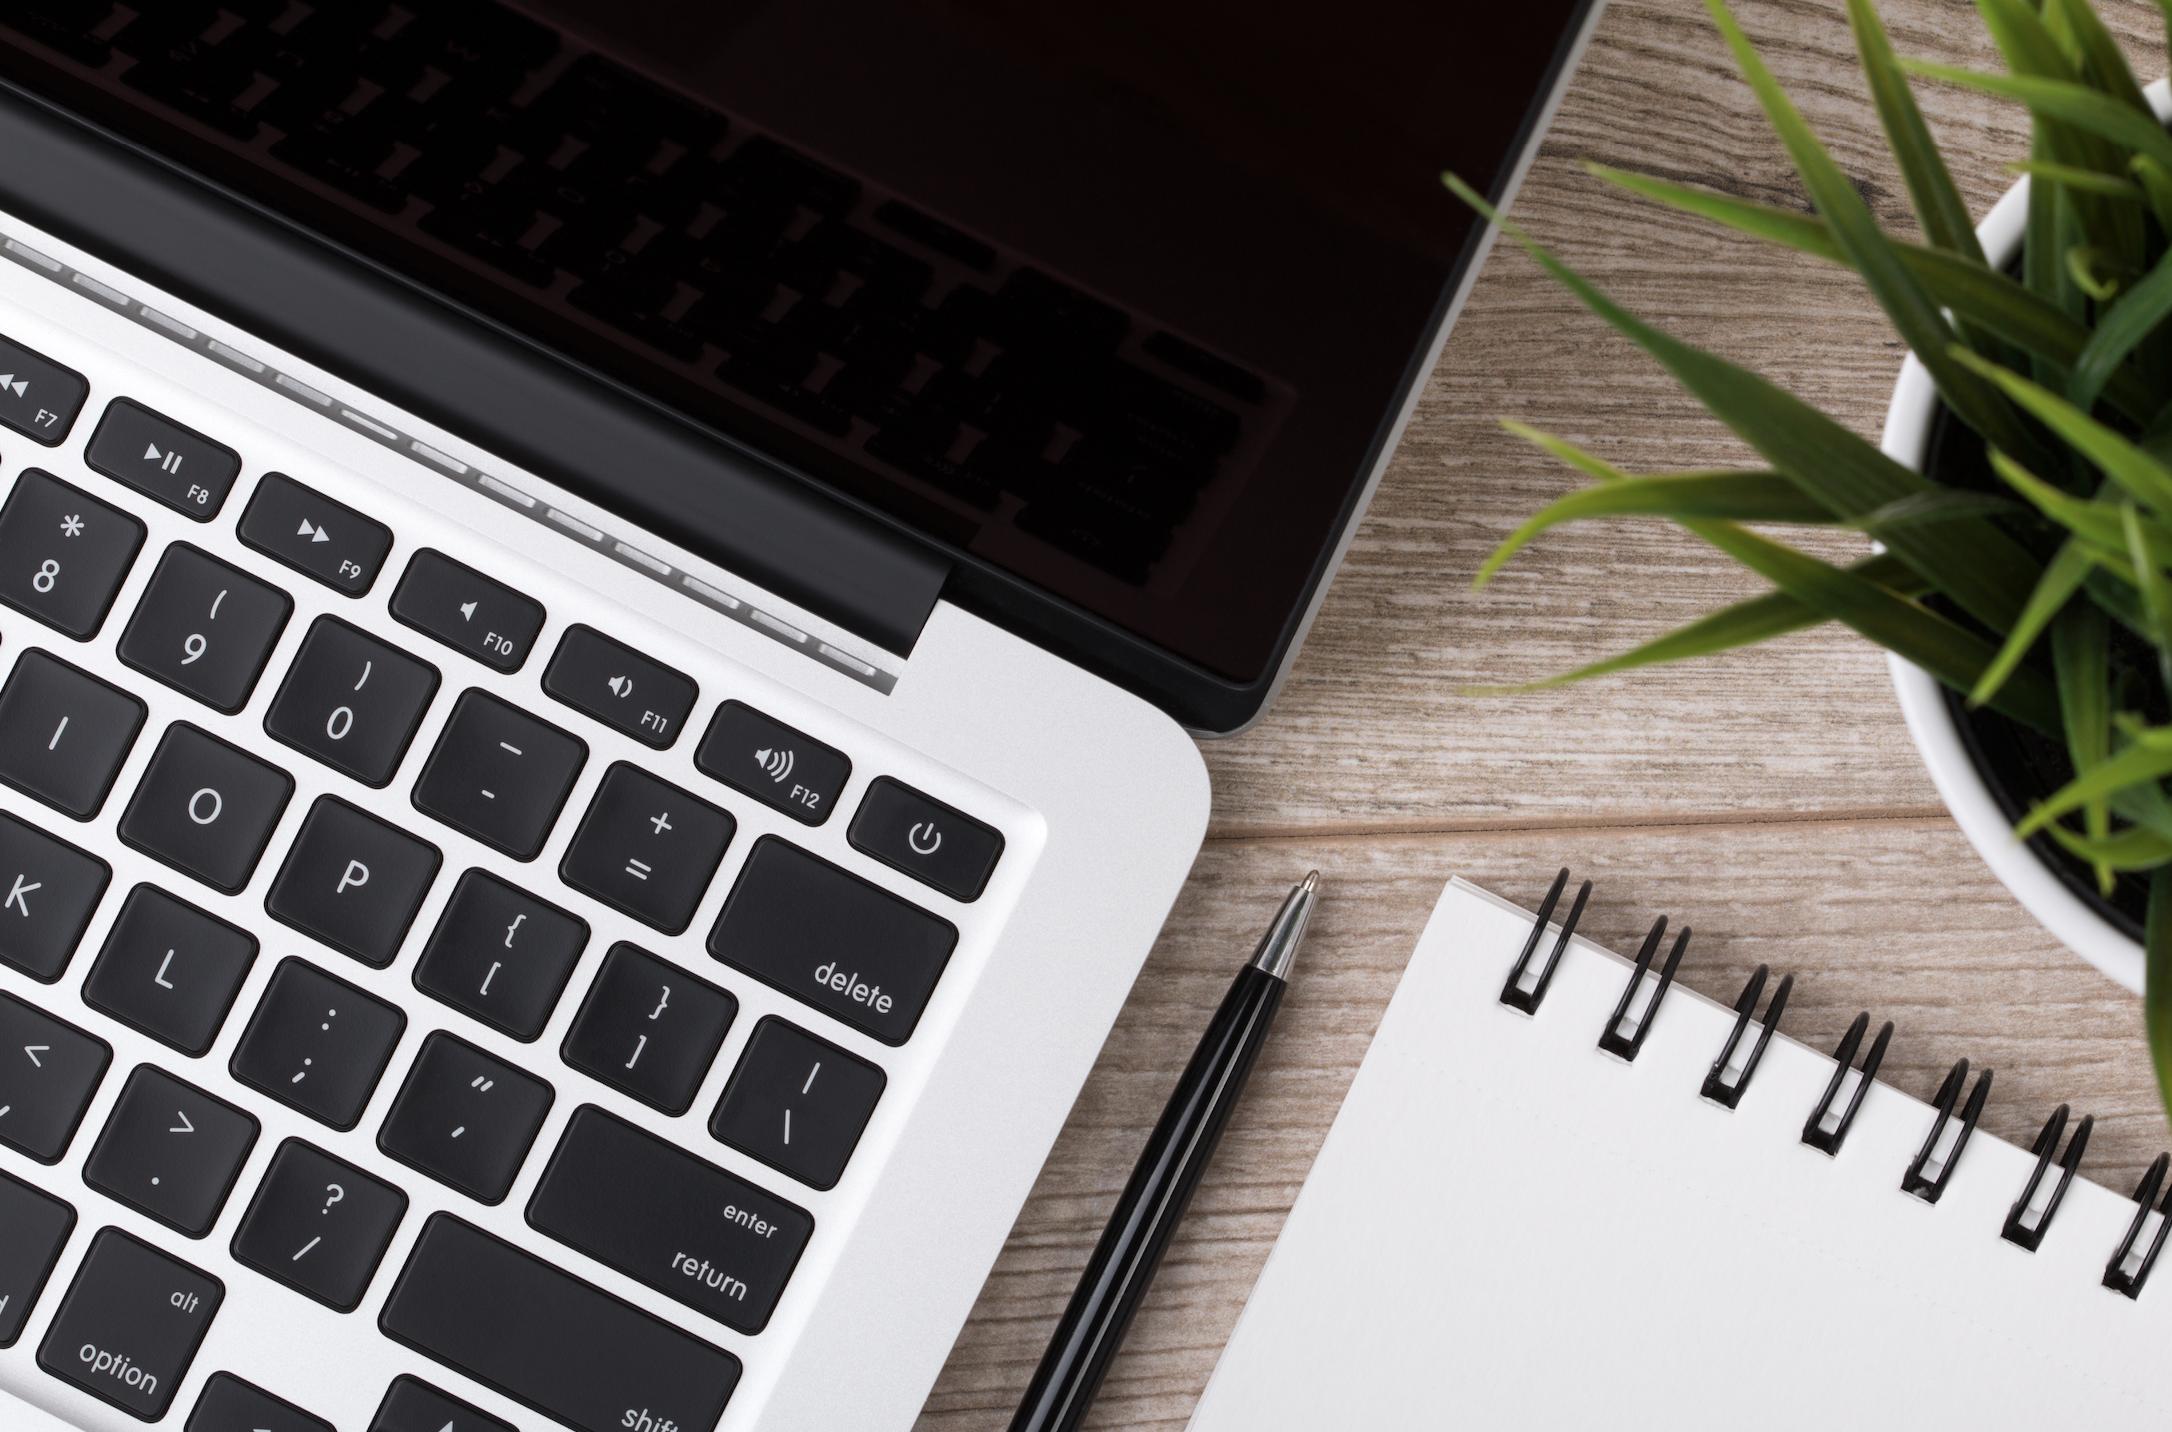 business blog, small business blog, blogging 2021, 2021 blogs, blog marketing tips, blog strategies, why business blog, blog marketing tips, blog beginner, new blog